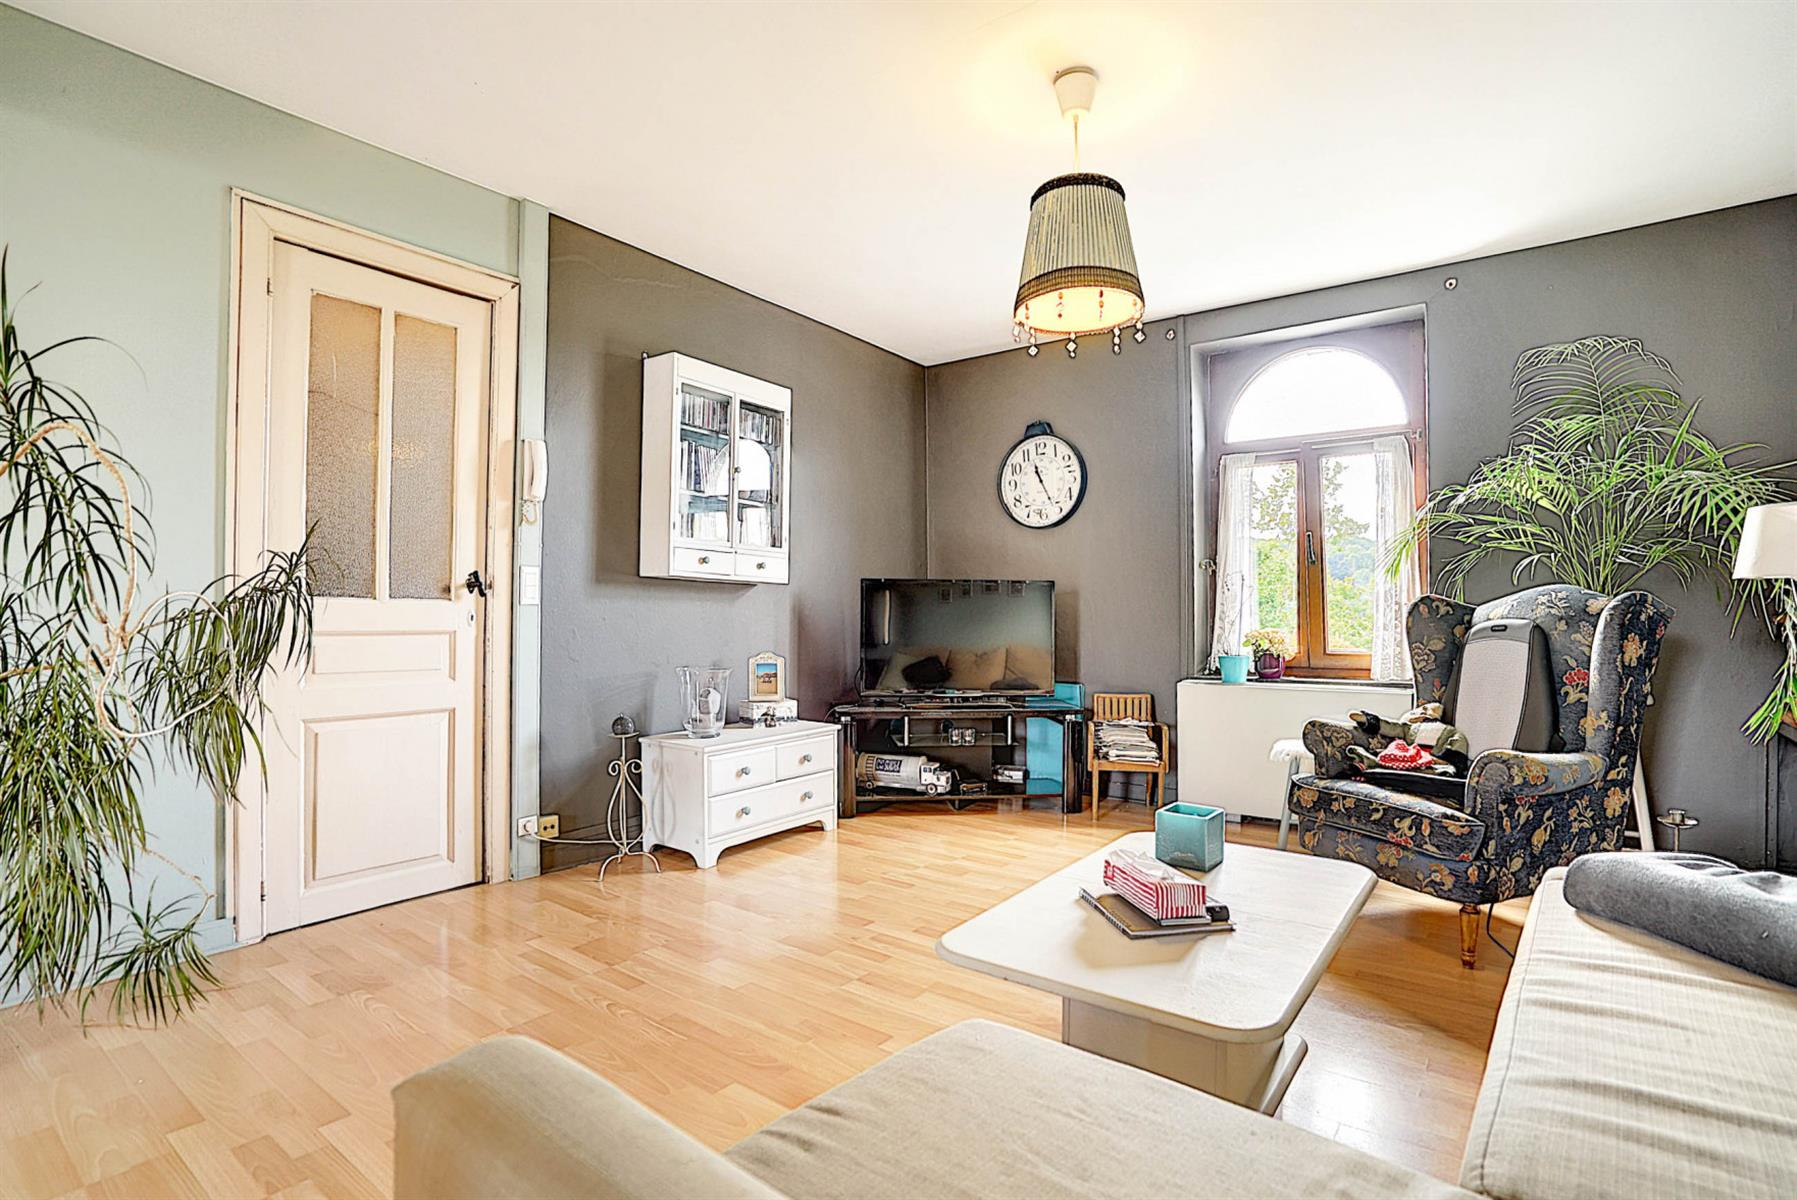 Maison - Bousval - #4131618-26